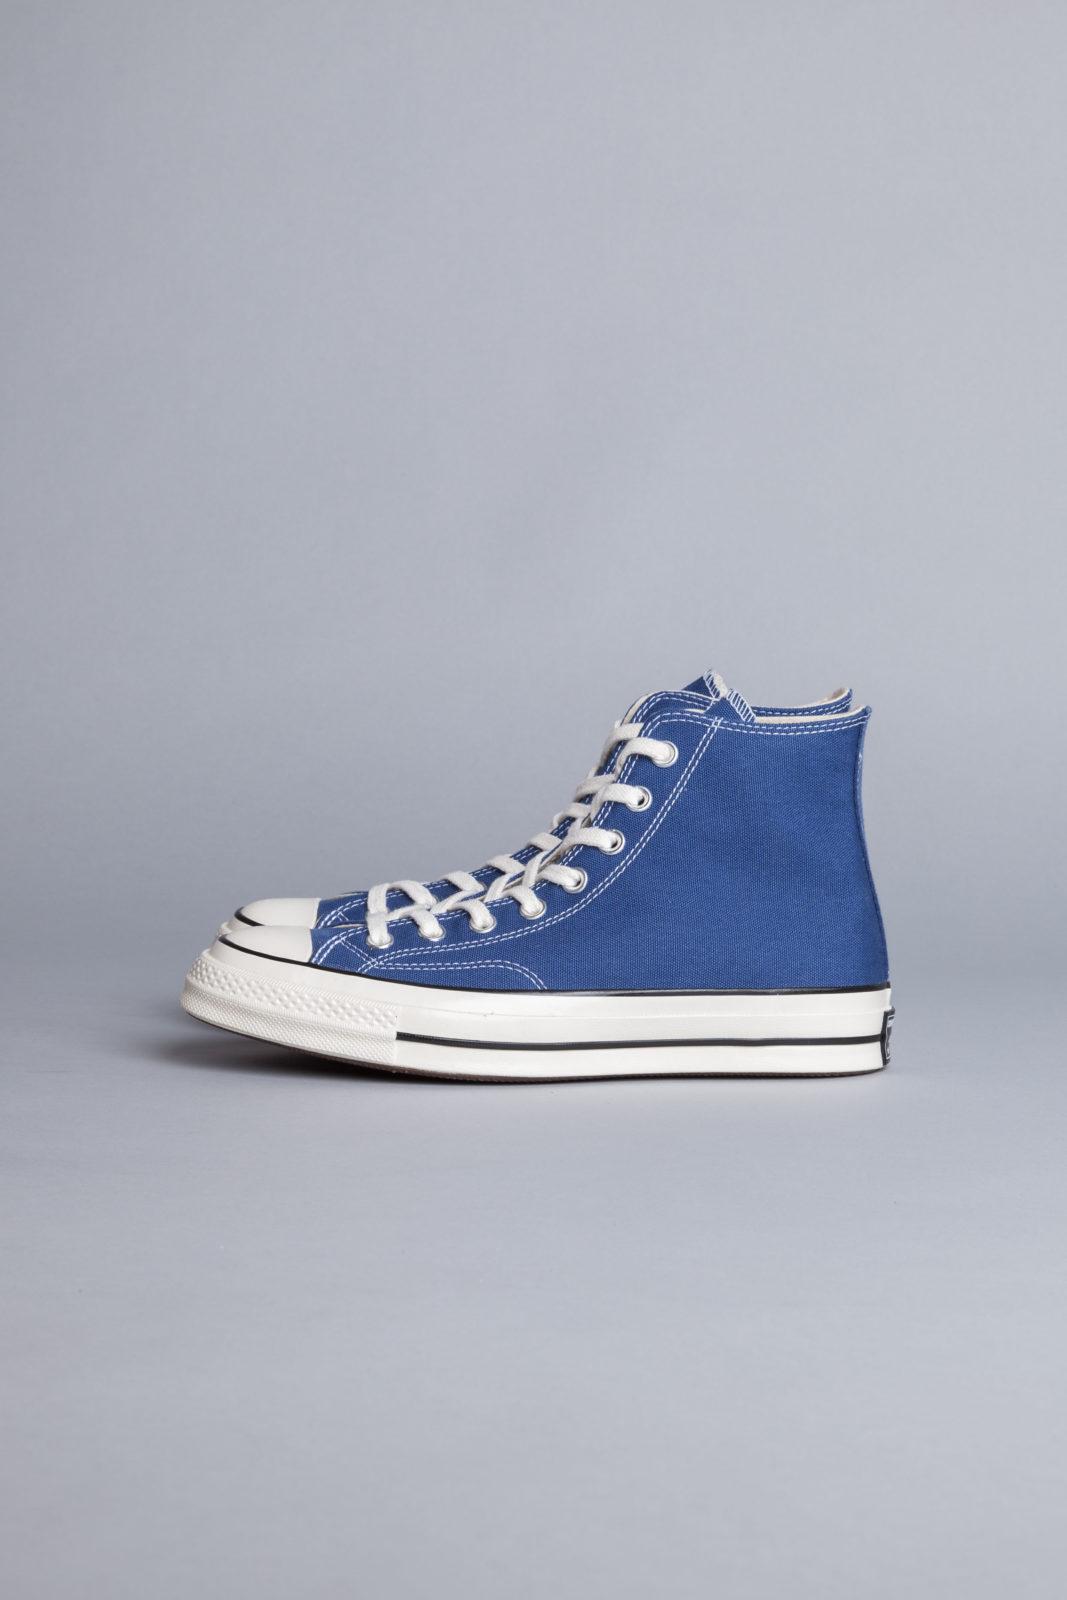 a23b6f32b75f Converse Chuck Taylor 70 True Navy all star shoes  Converse ...